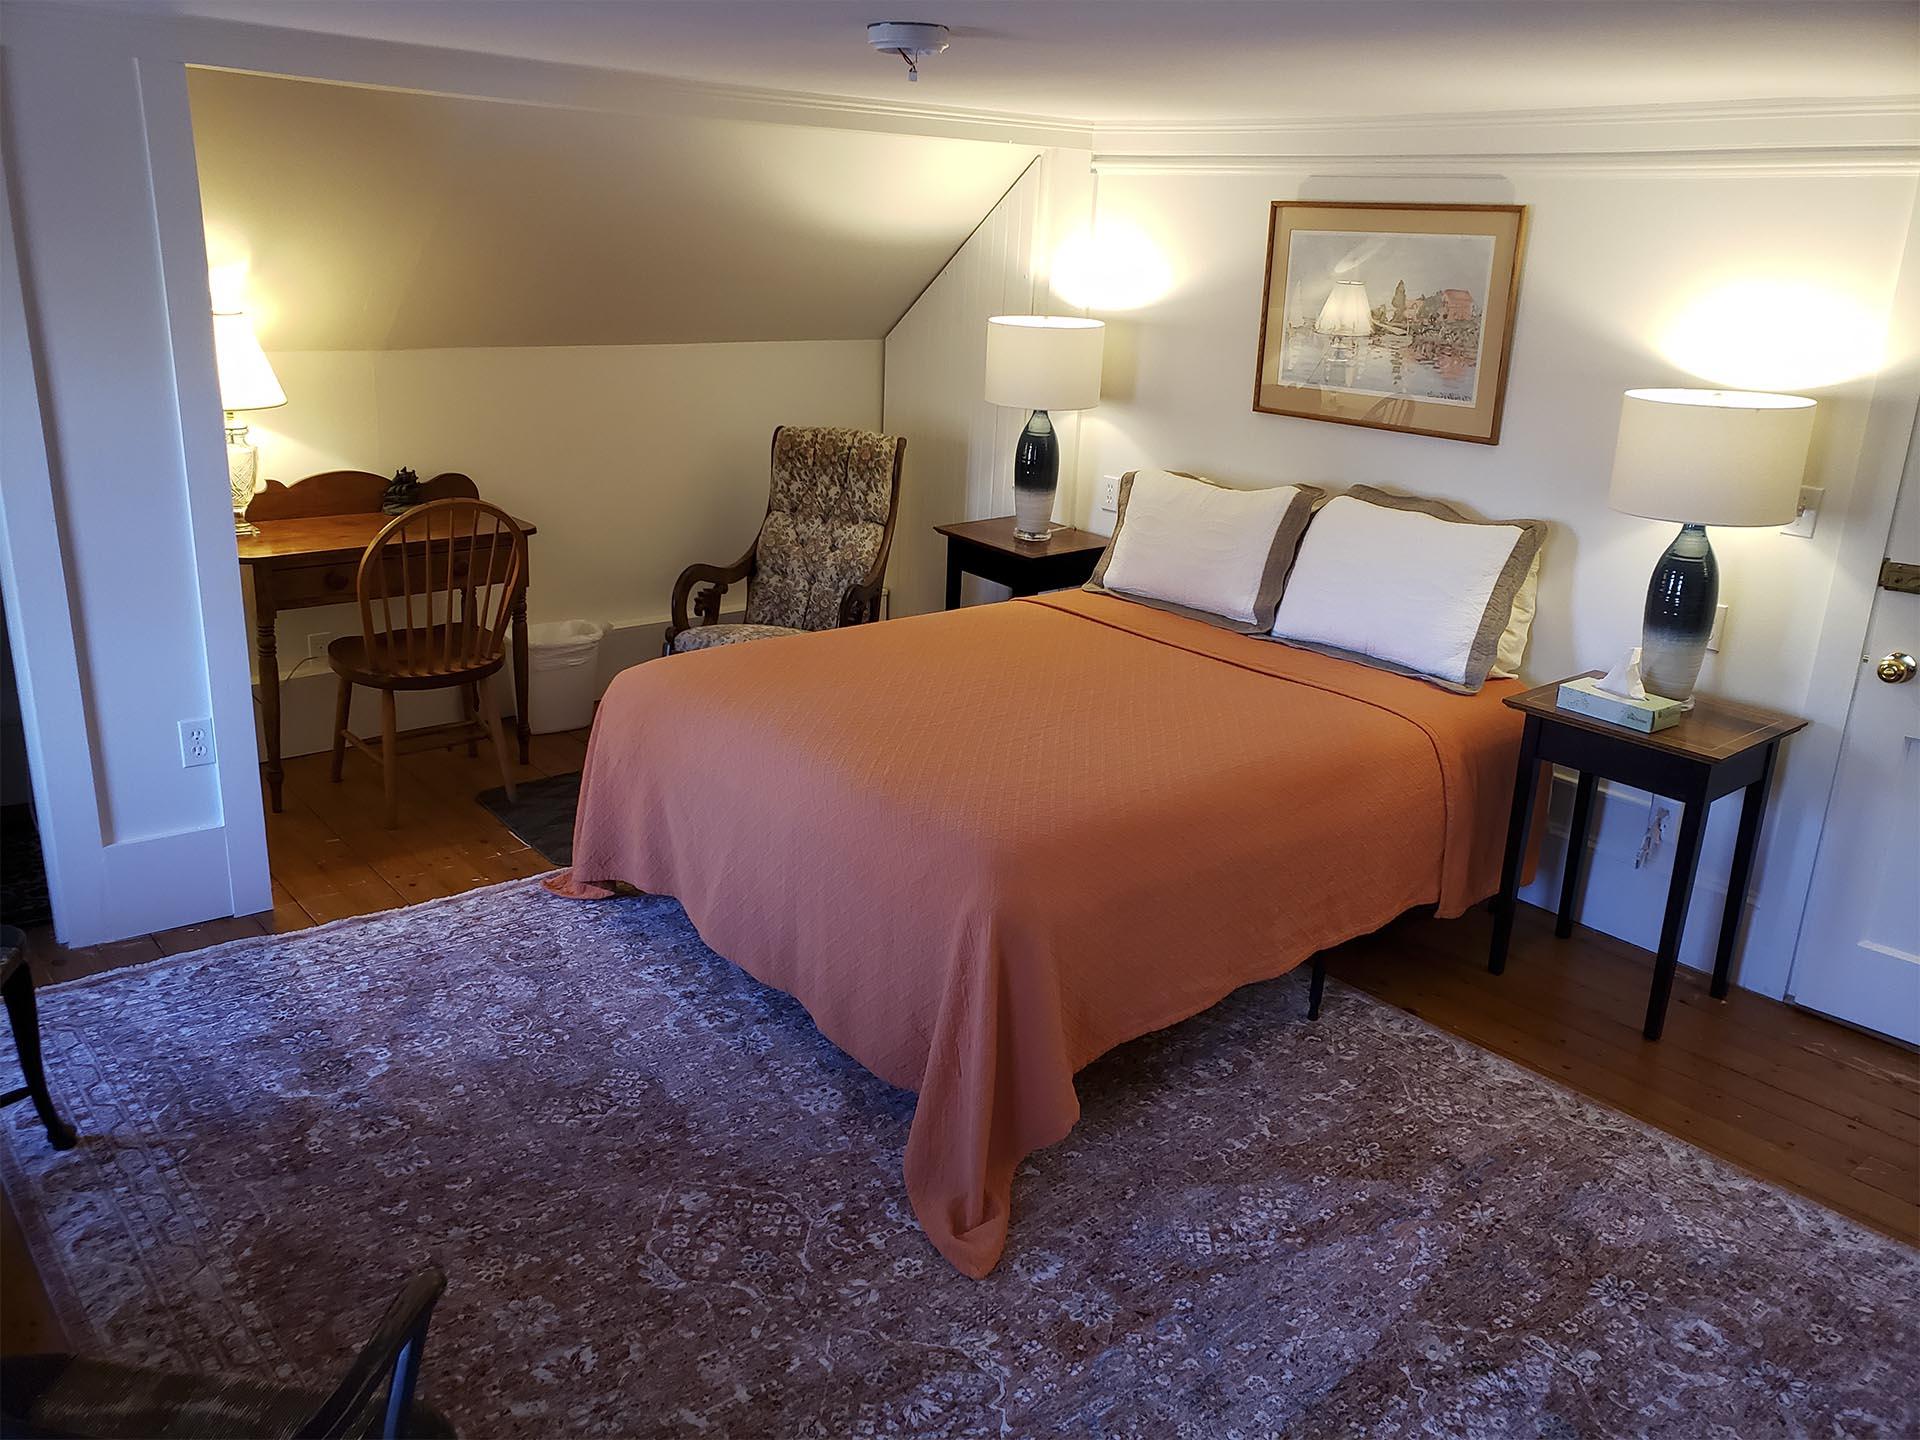 Inn Personal Rustic Room